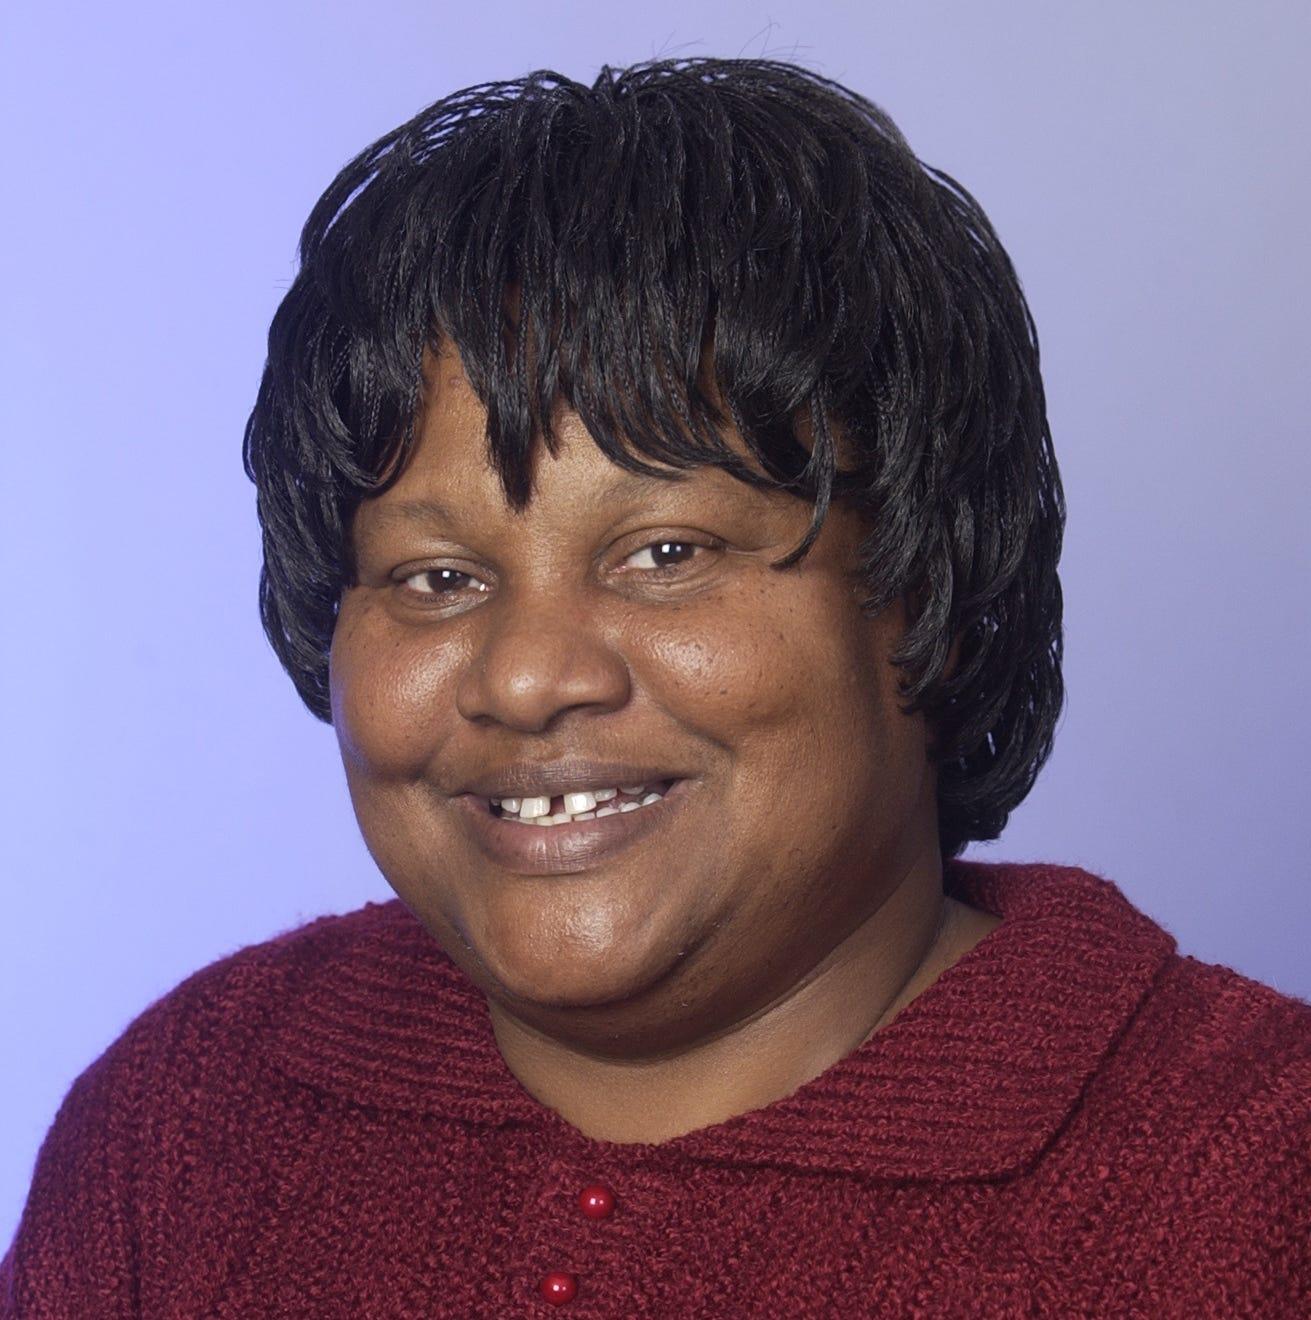 Radio personality, leader Jenelle Chargois dies